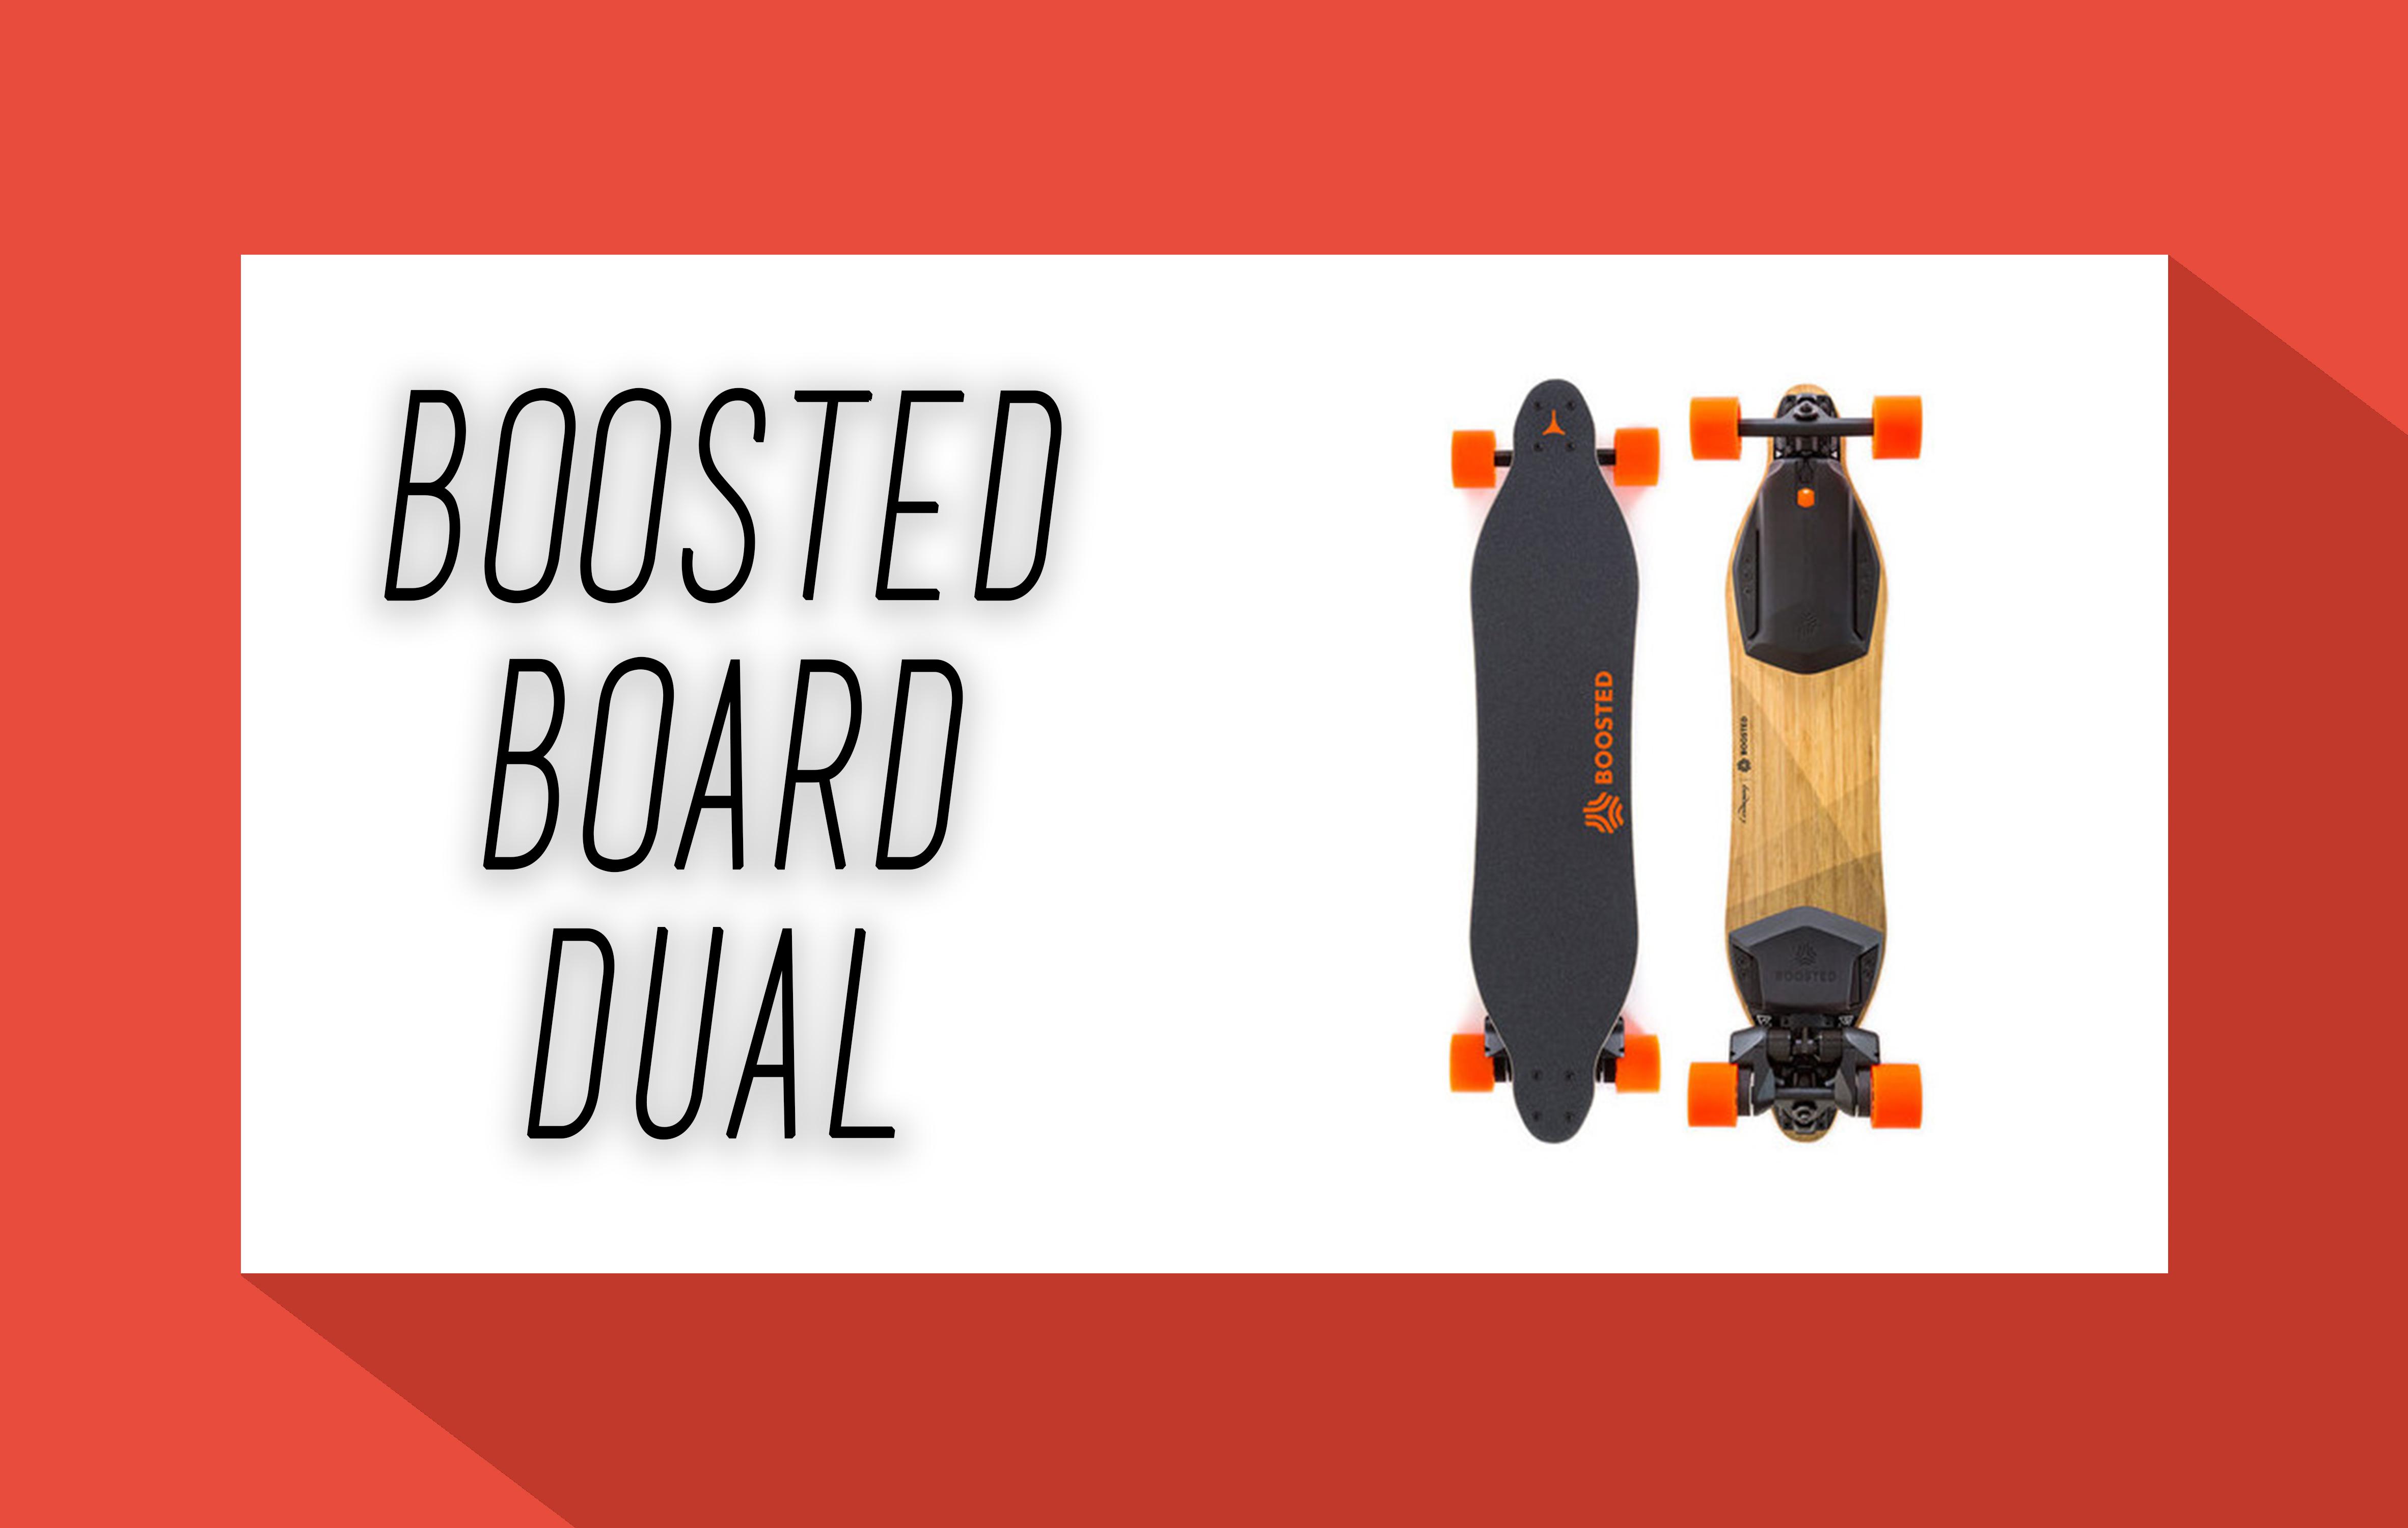 boosted board dual elektro skateboard. Black Bedroom Furniture Sets. Home Design Ideas